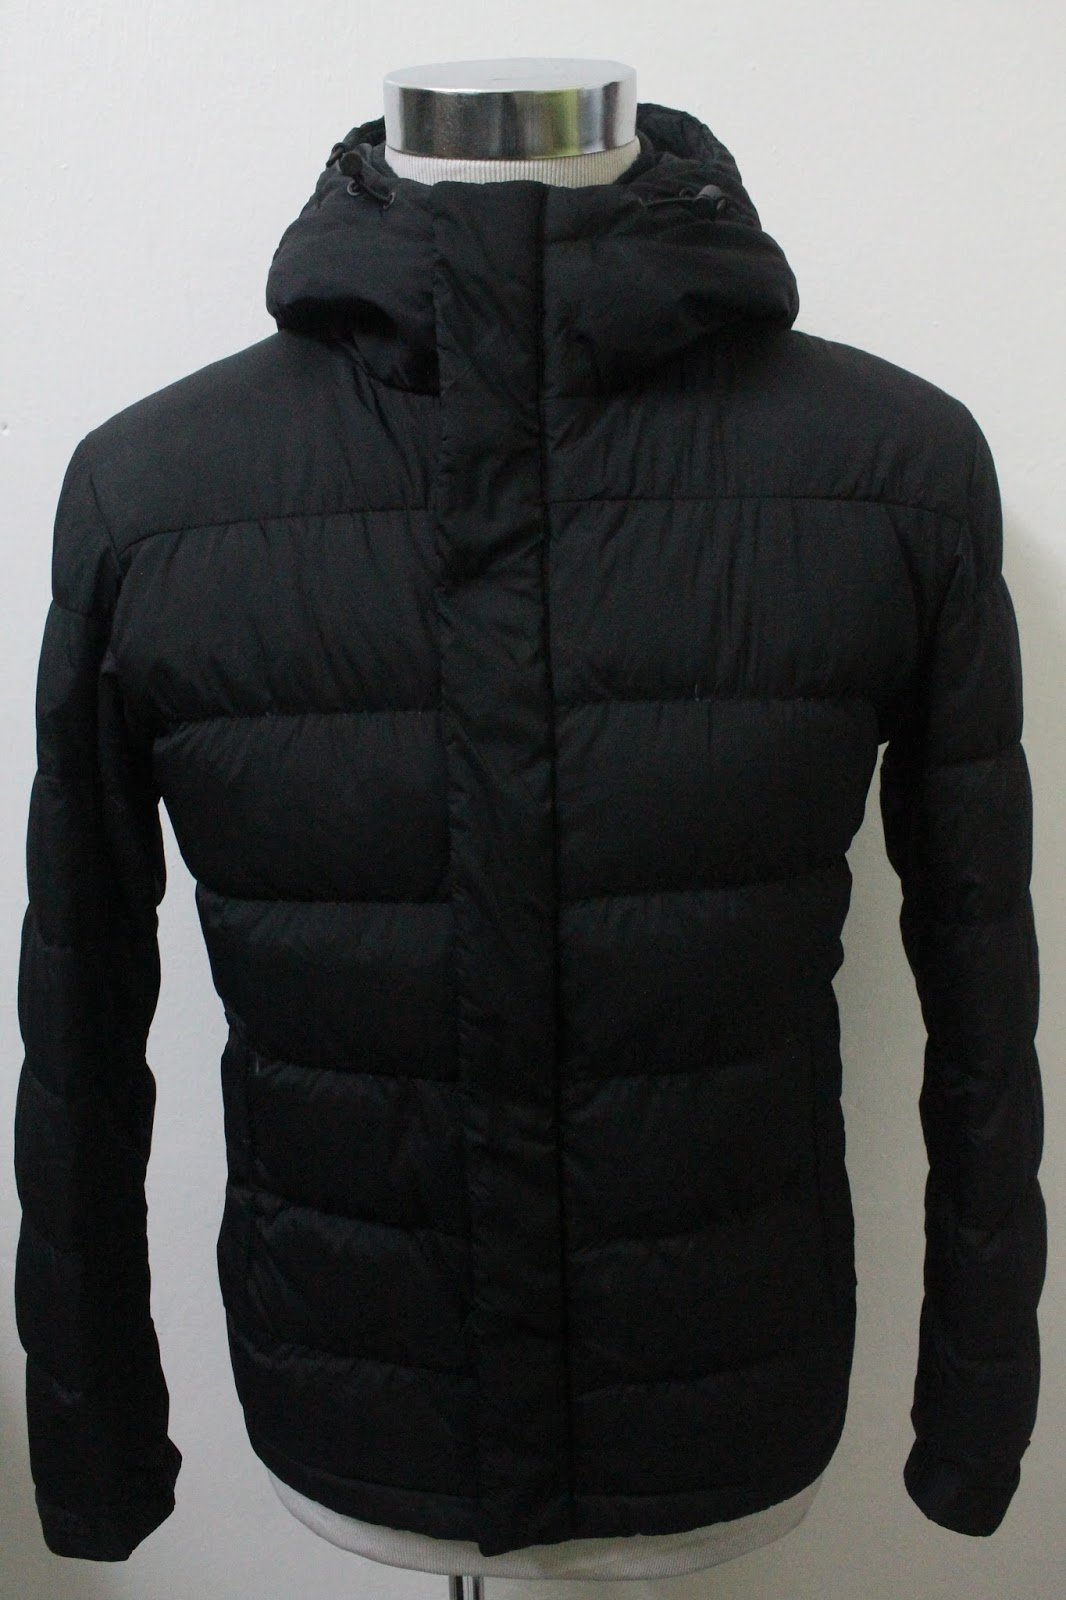 bundlebarangbaek original uniqlo winter hoodie jacket for. Black Bedroom Furniture Sets. Home Design Ideas